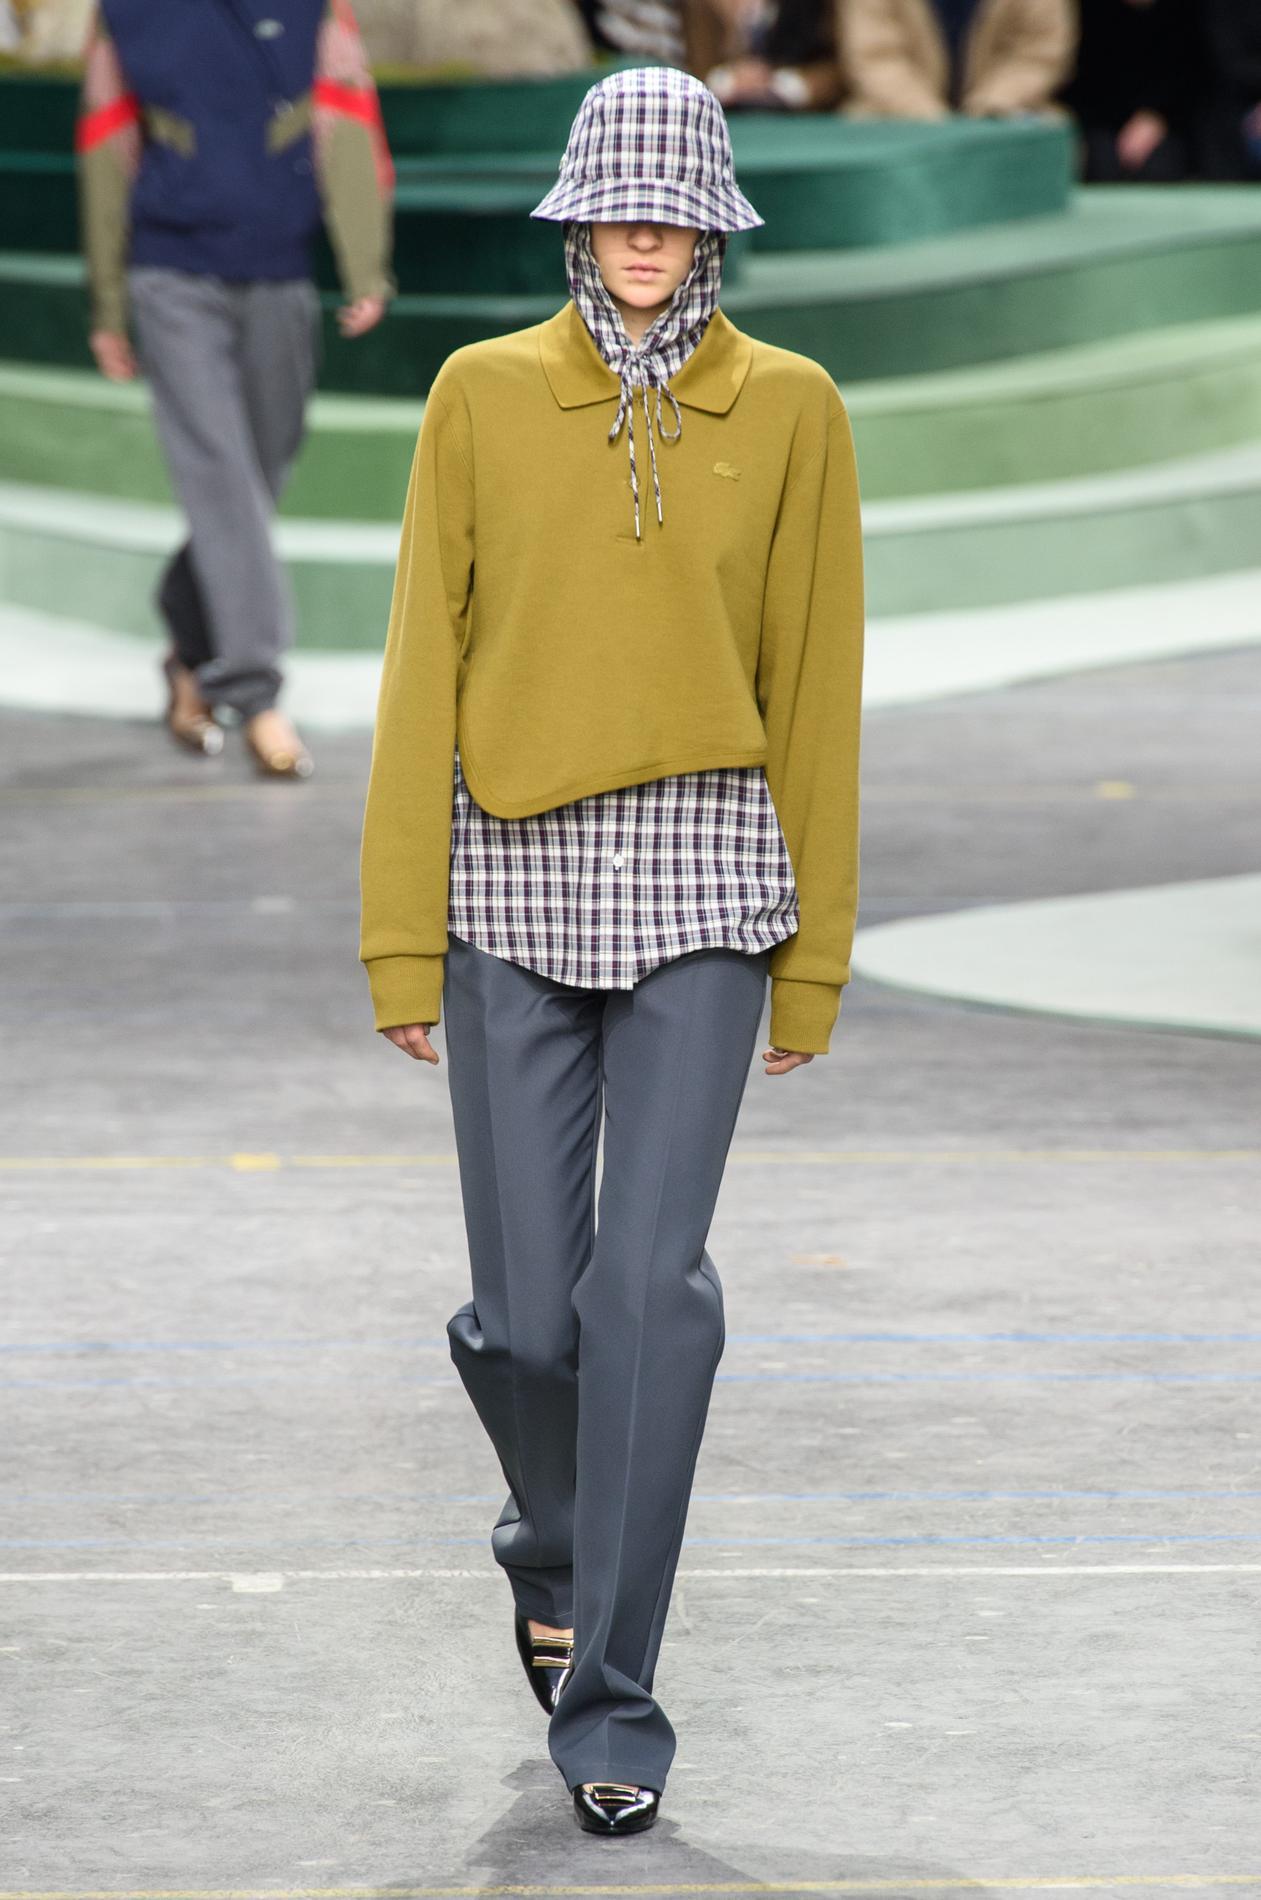 Le Sportwear Figaro De Velours Denim Madame Chic Lacoste wvpqR5n8R